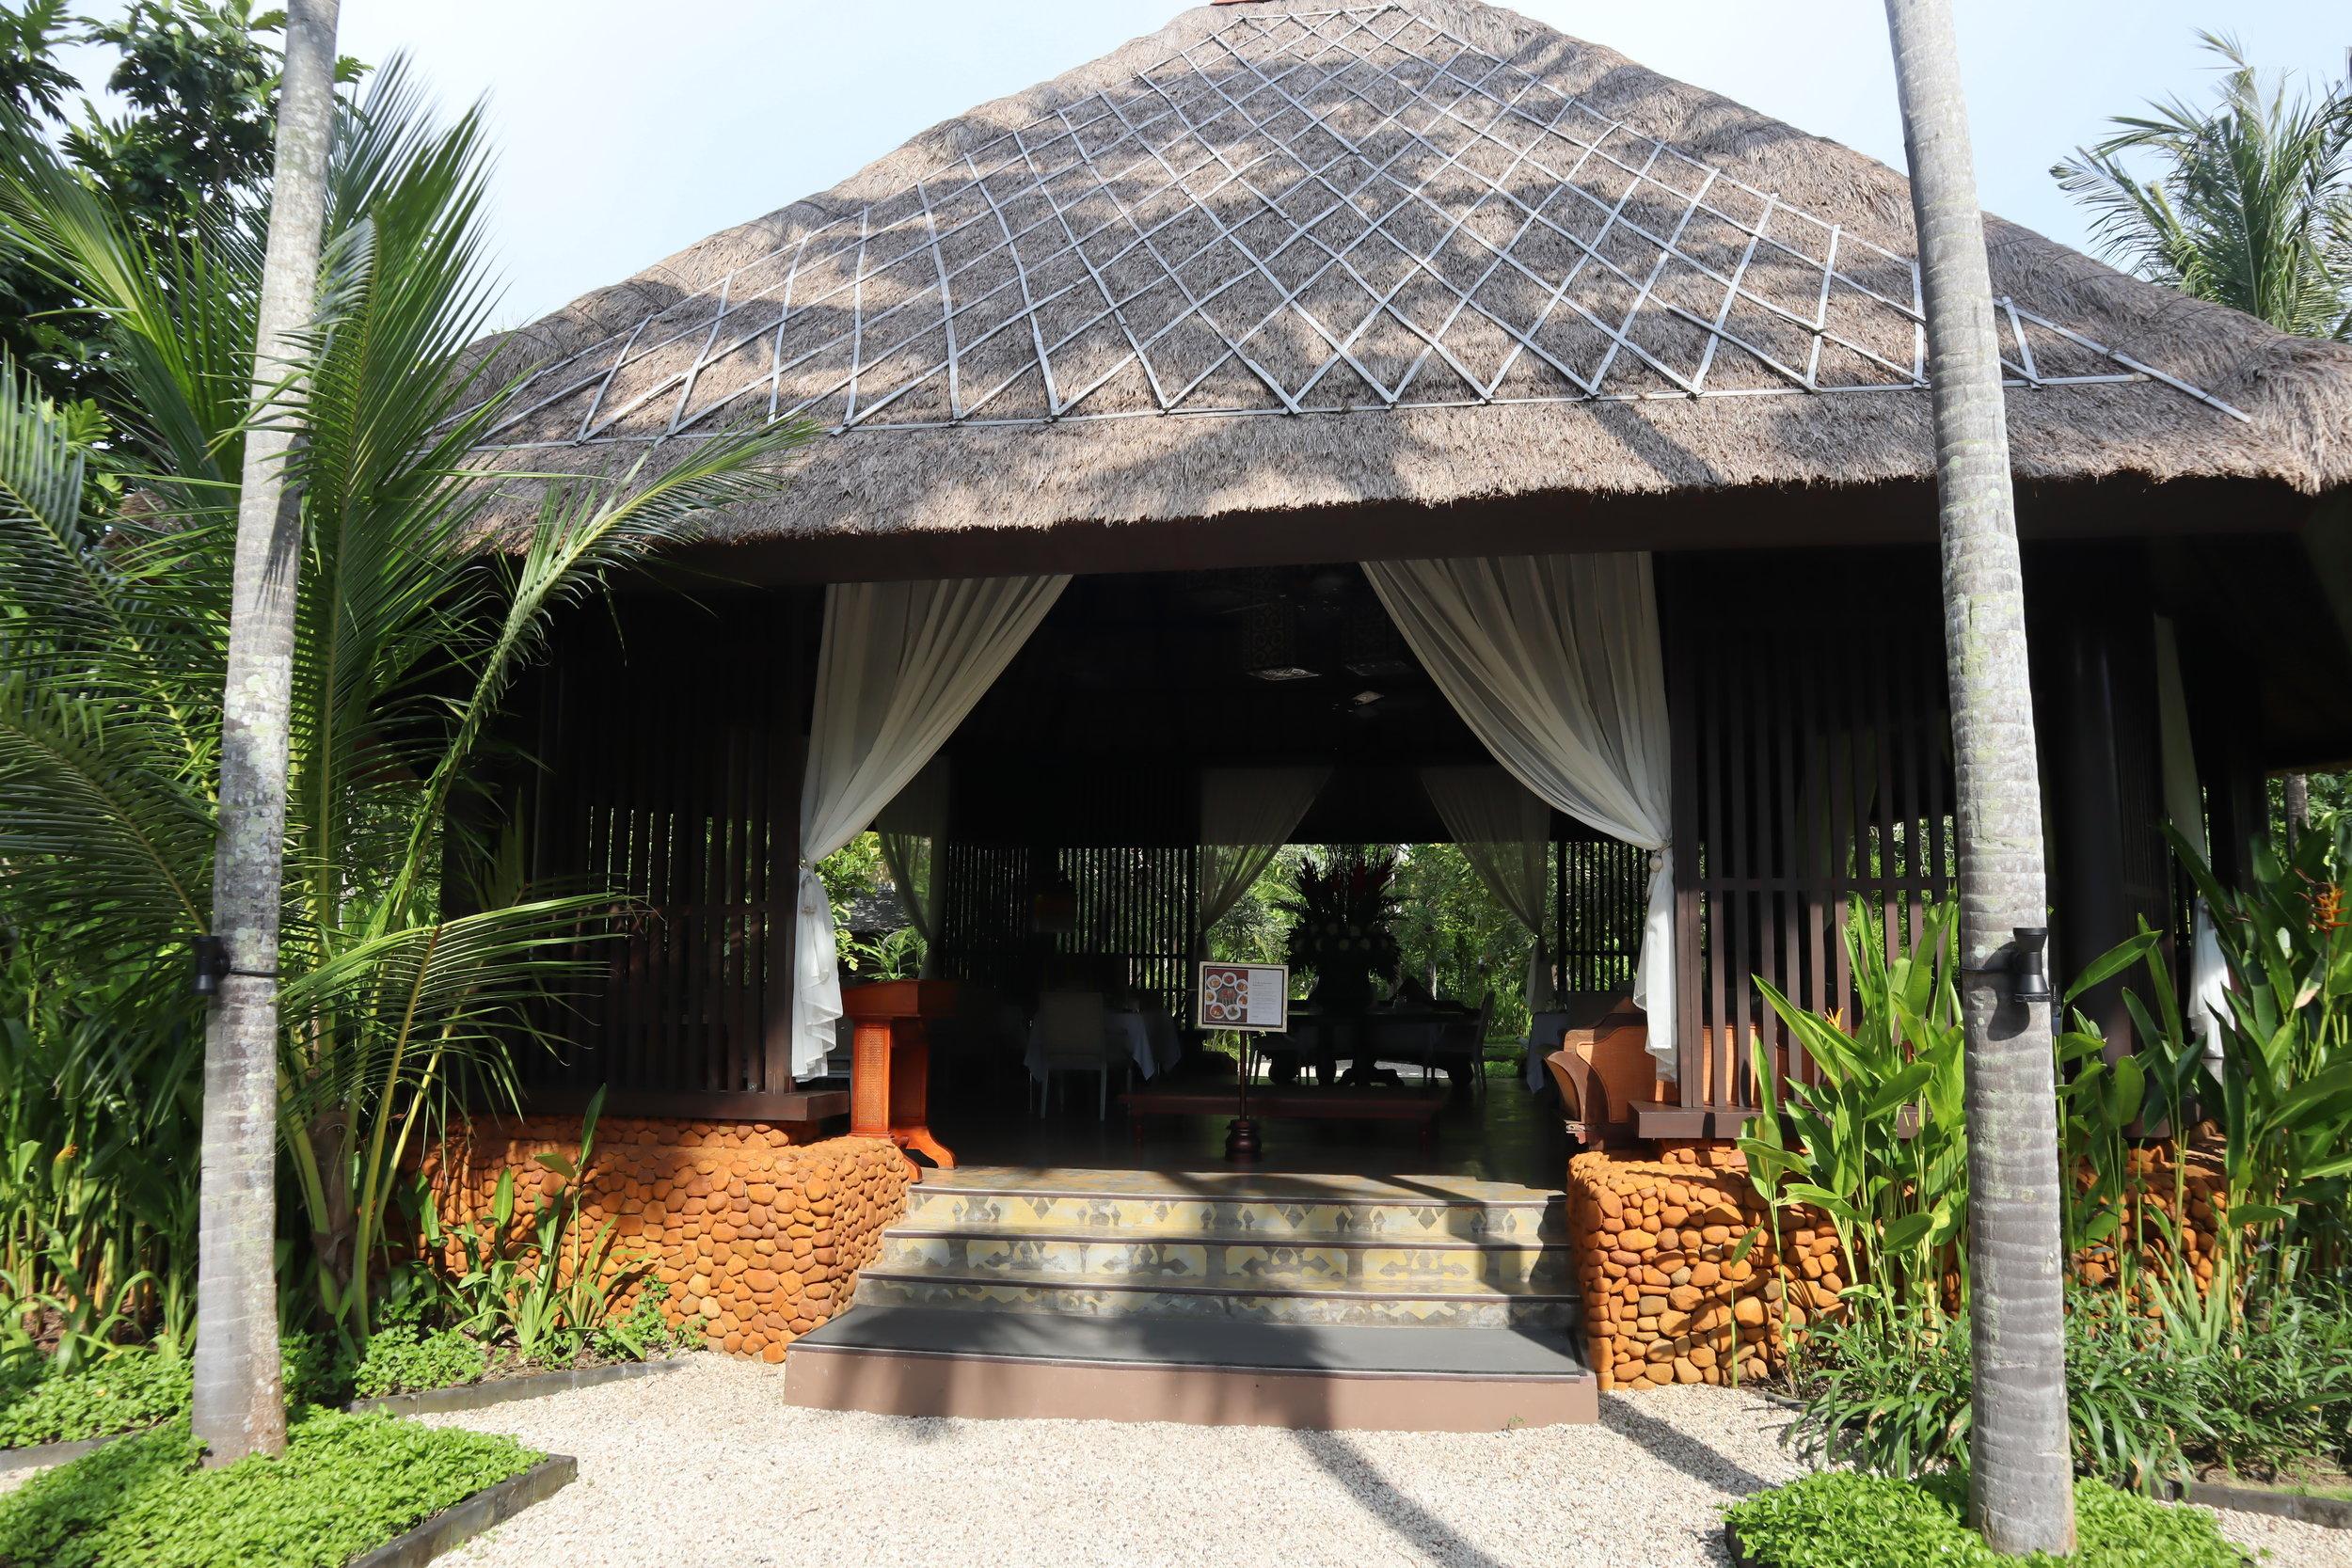 St. Regis Bali – Dulang restaurant